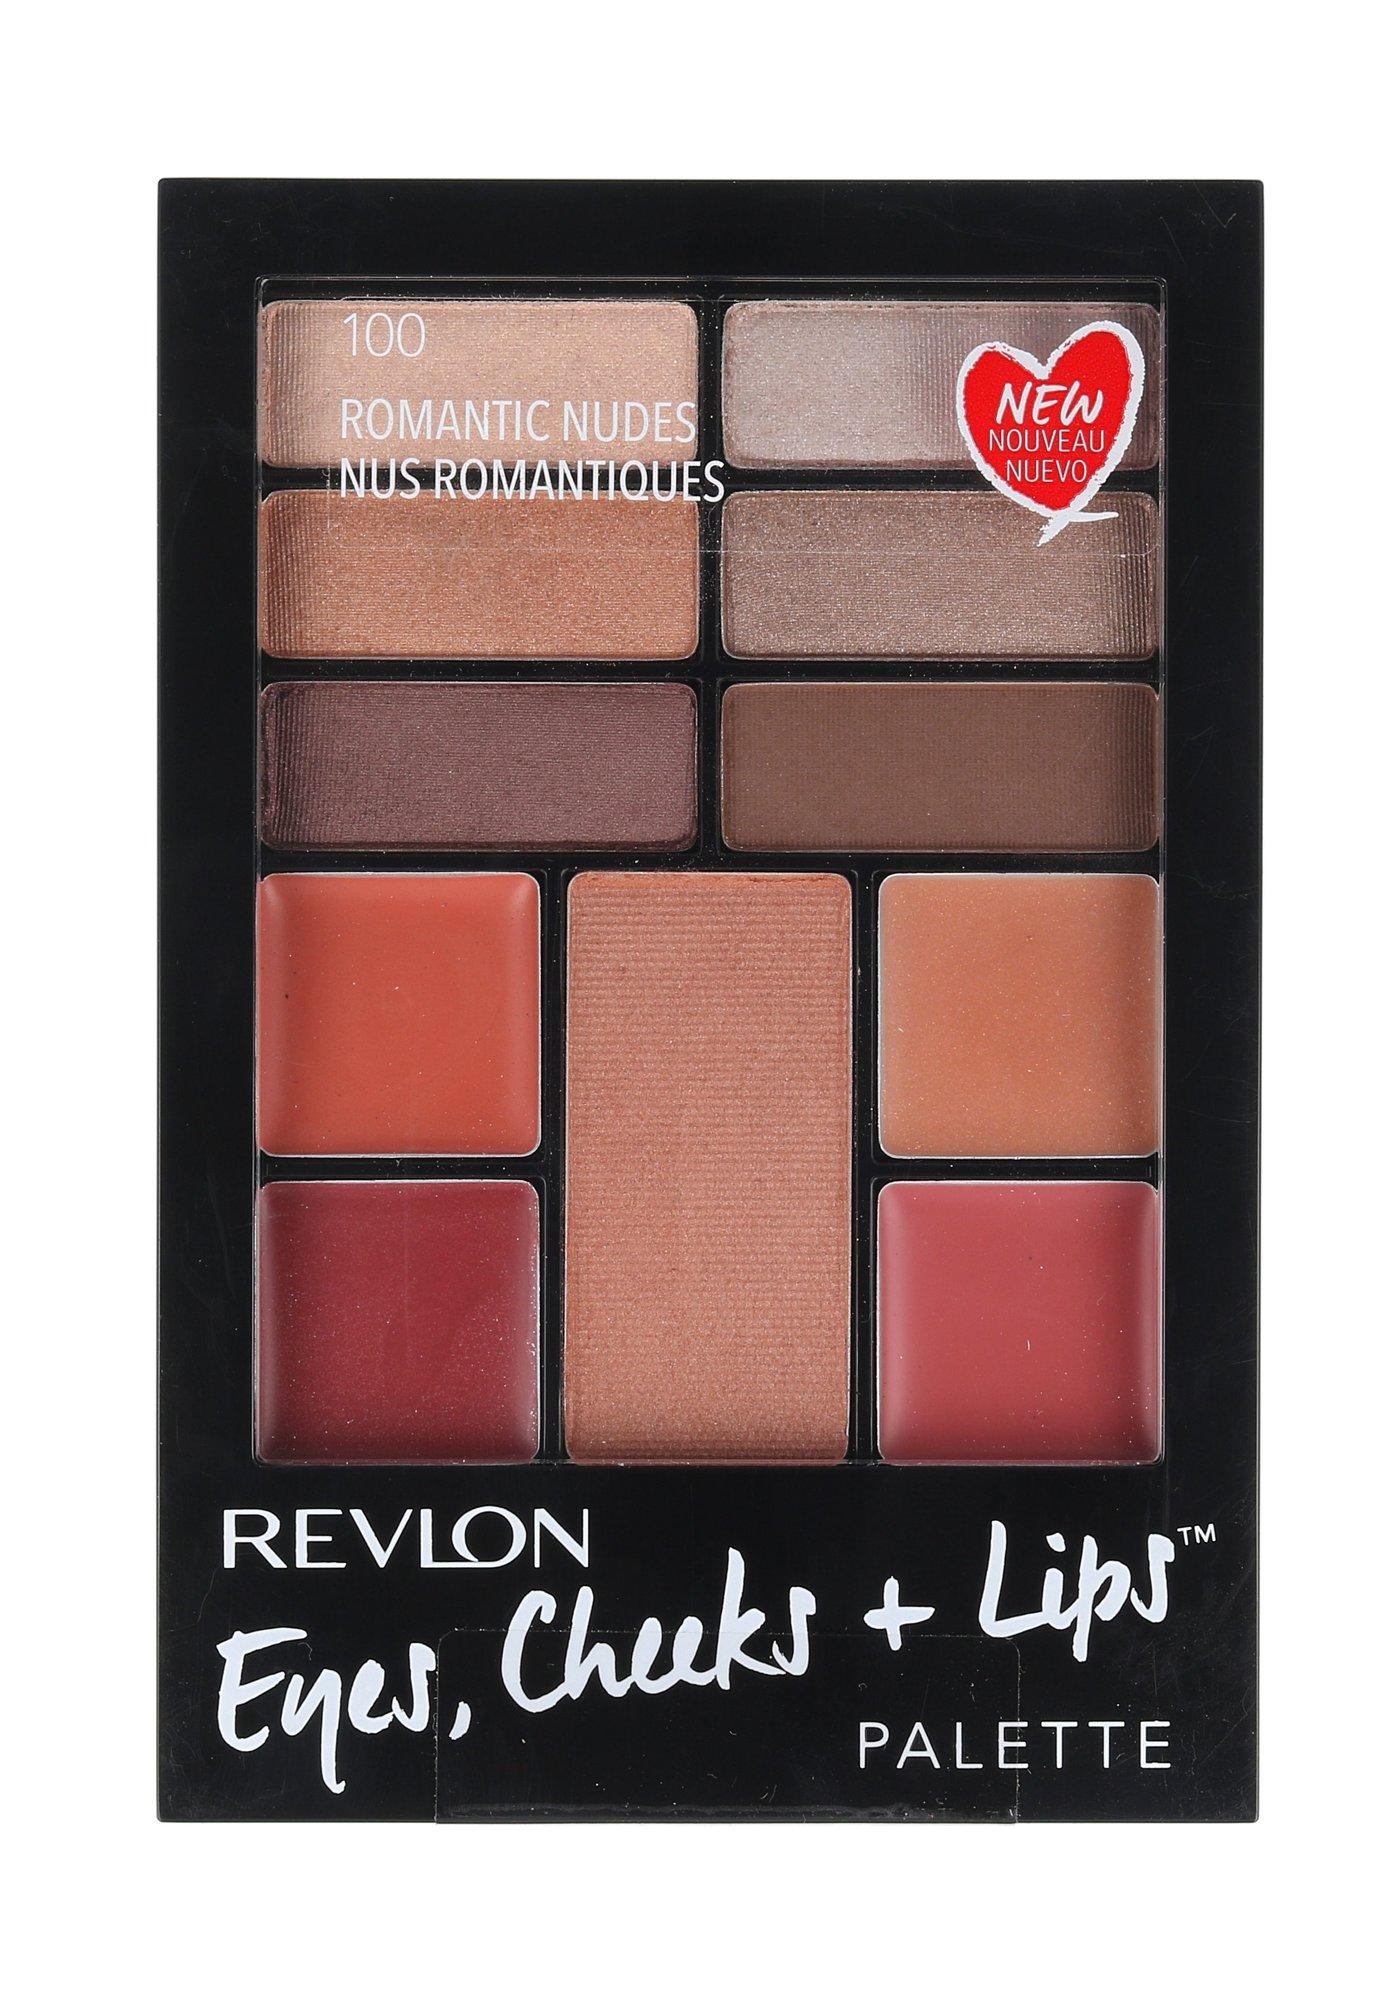 Revlon Eyes, Cheeks + Lips Cosmetic 15,64ml 100 Romantic Nudes